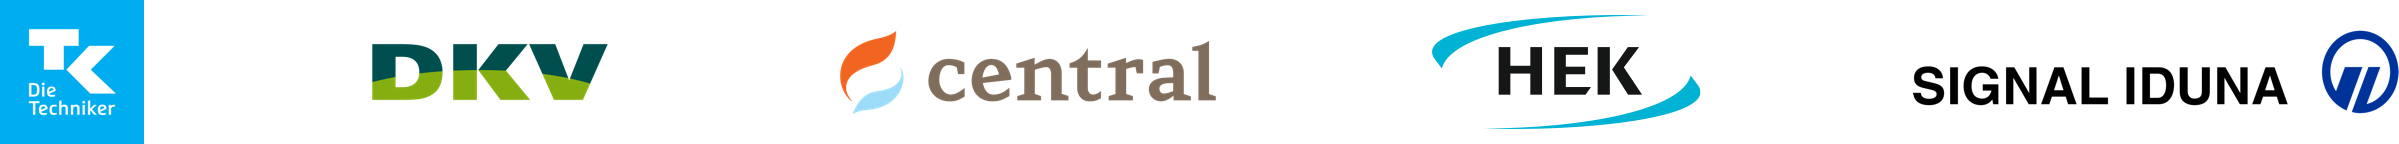 Mandanten: TK DKV Central Signal Iduna